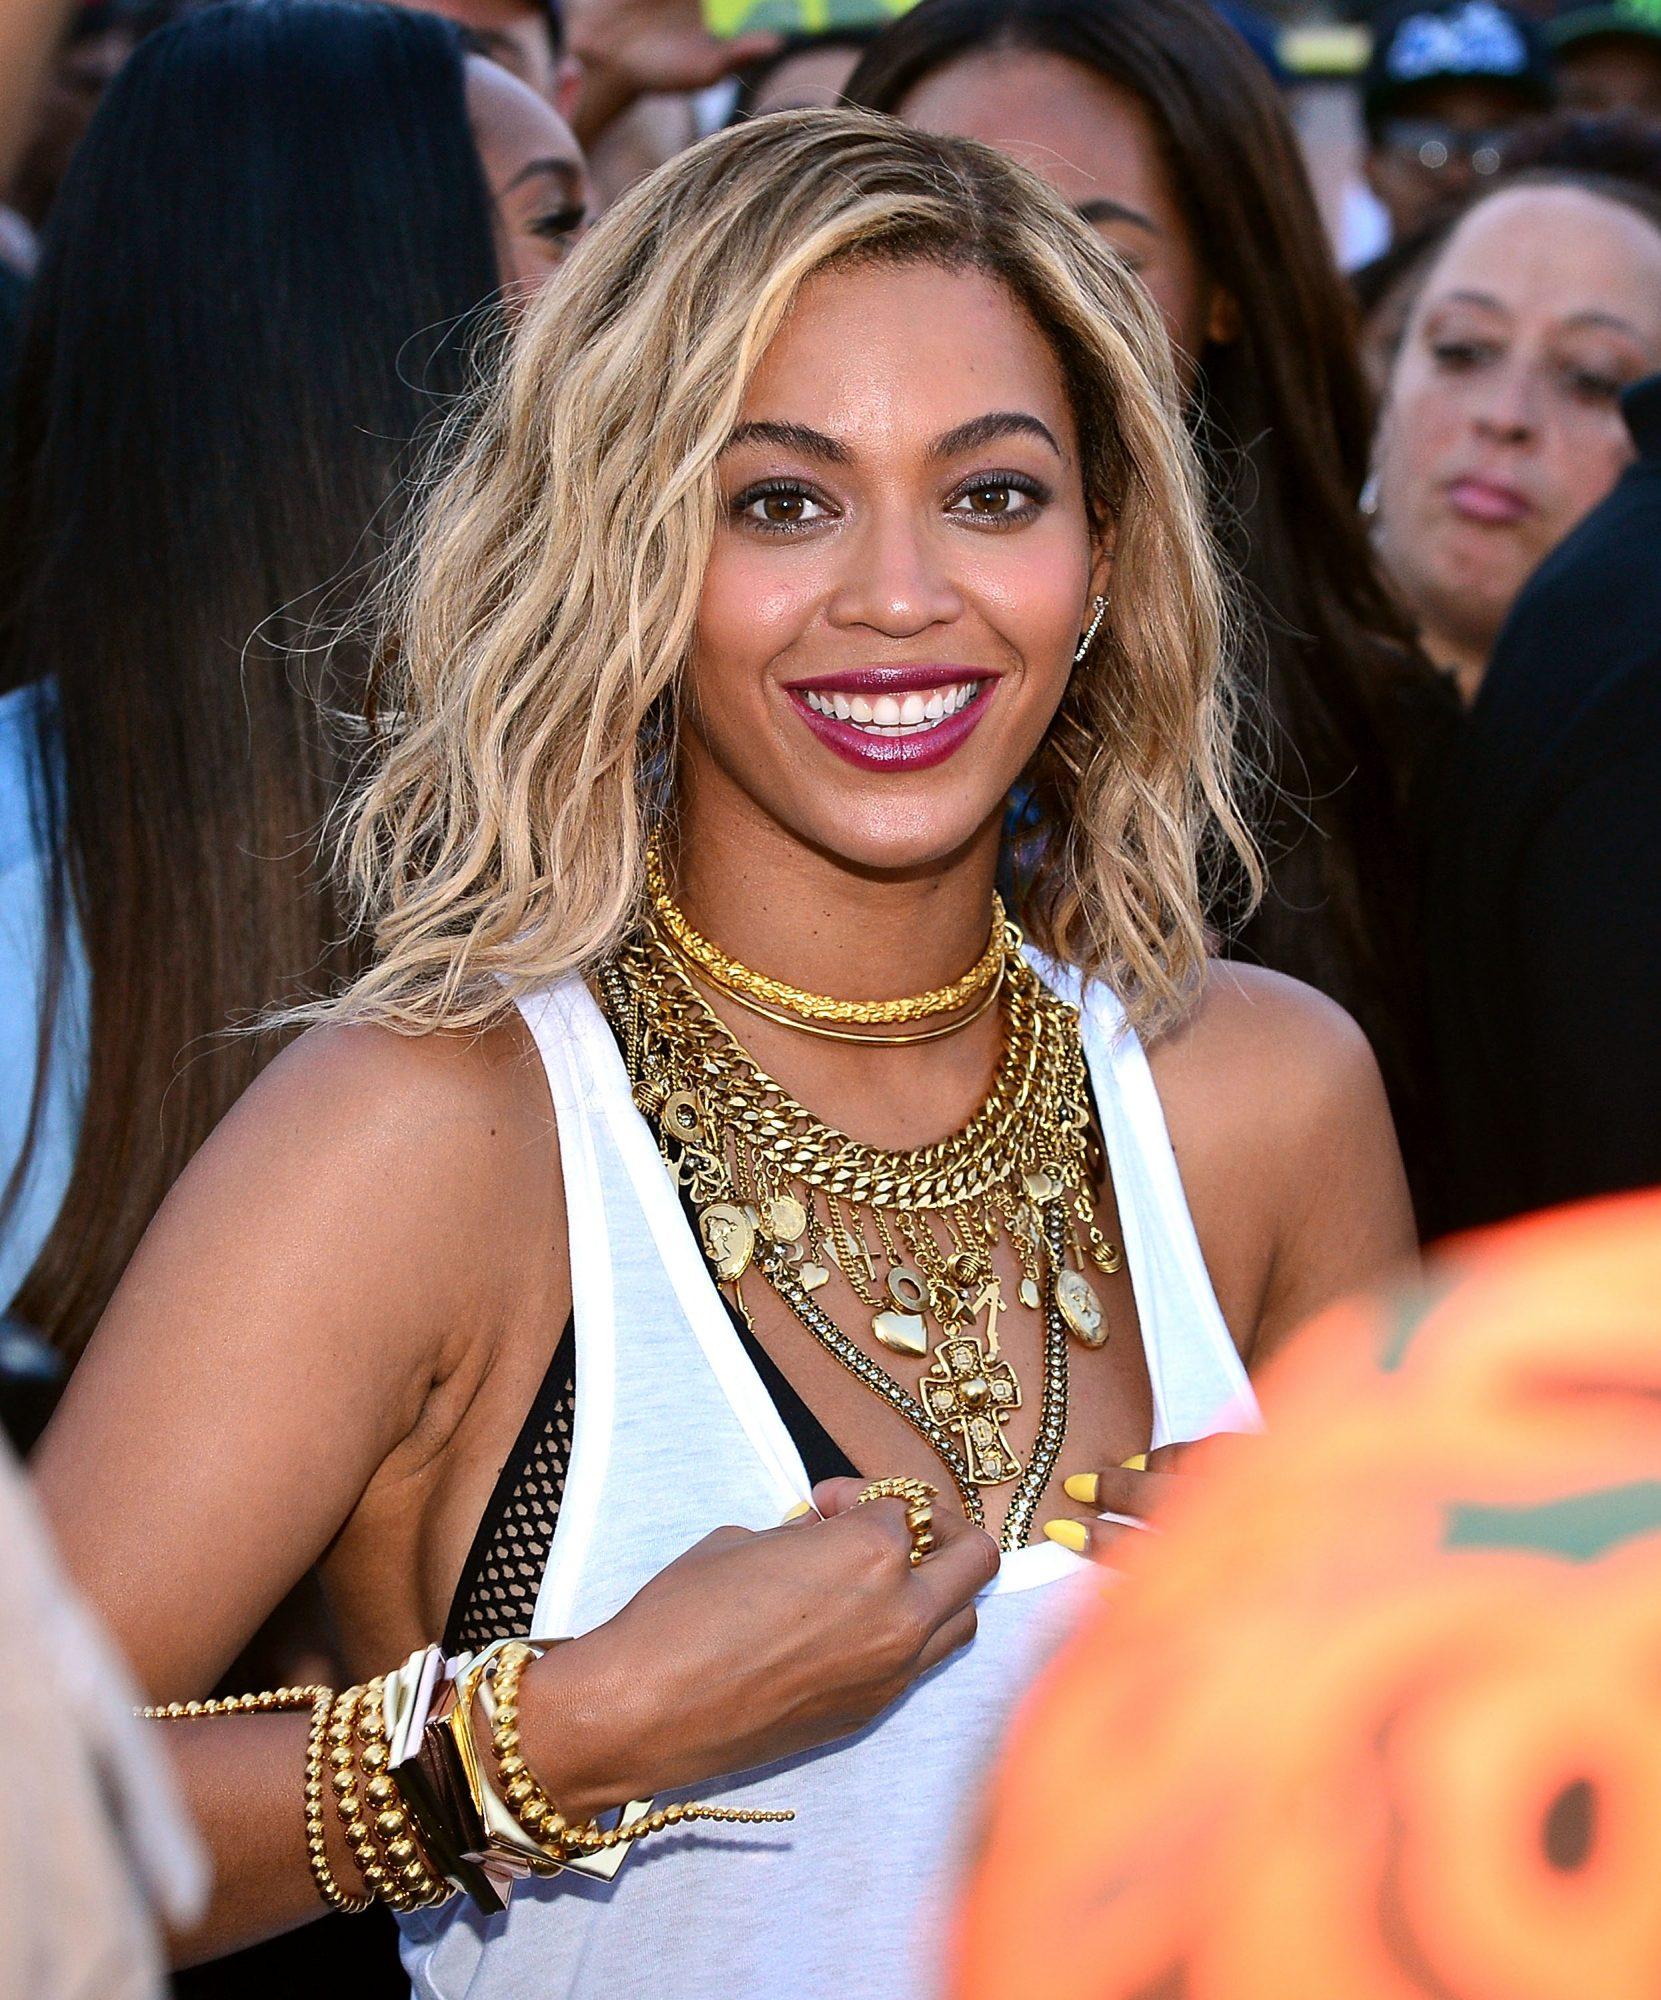 Paula Mendoza joyas prendas Beyonce